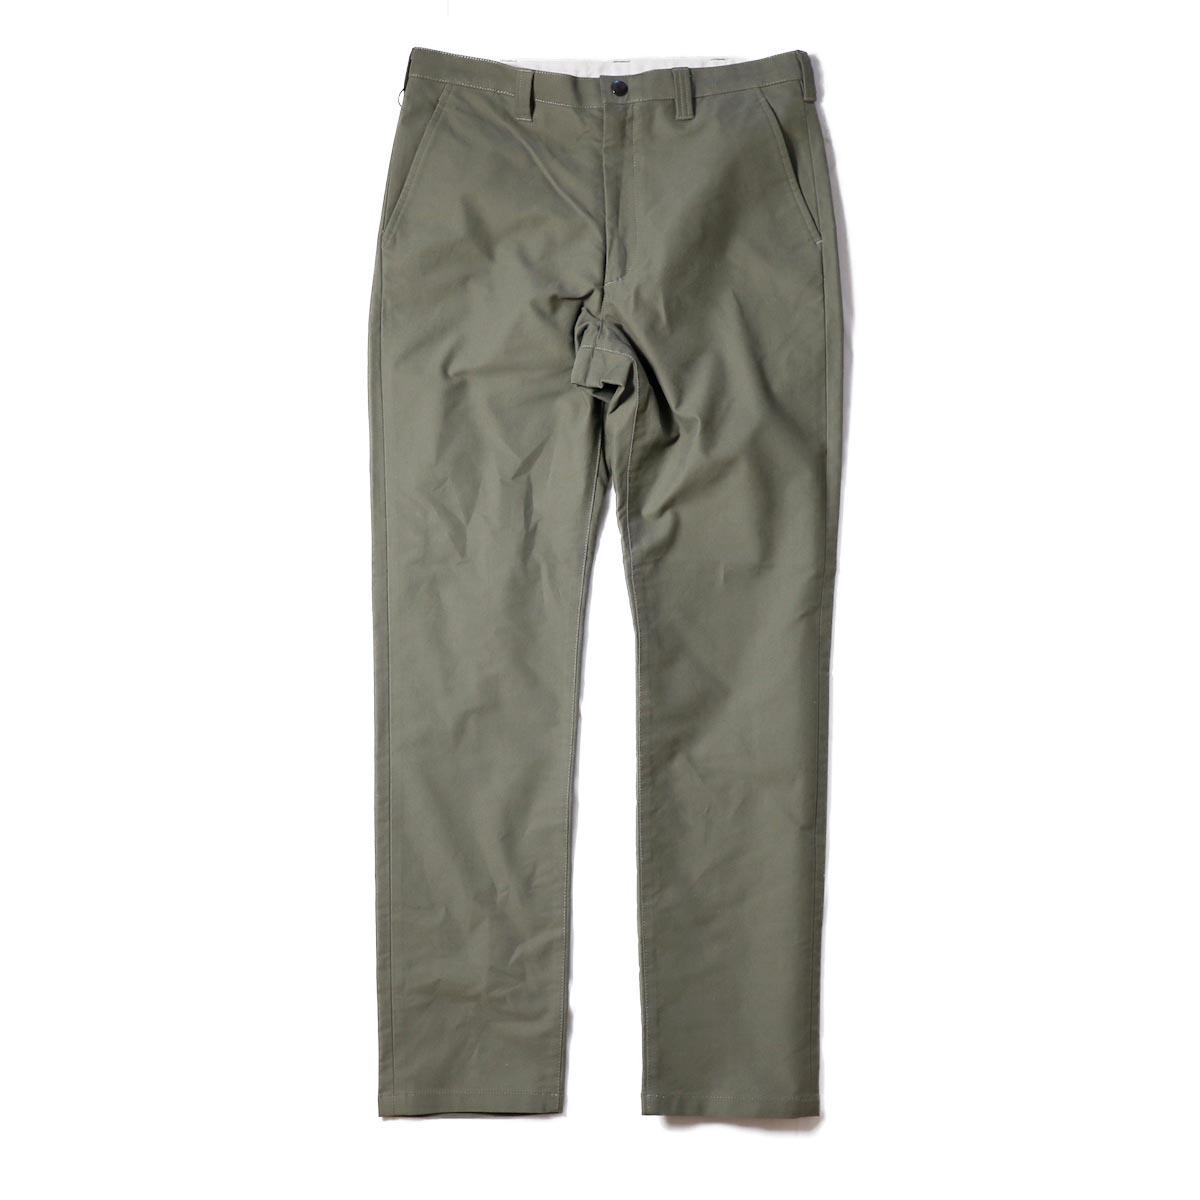 N.HOOLYWOOD / 282-CP04-029peg SLIM STRETCH PANT -Khaki